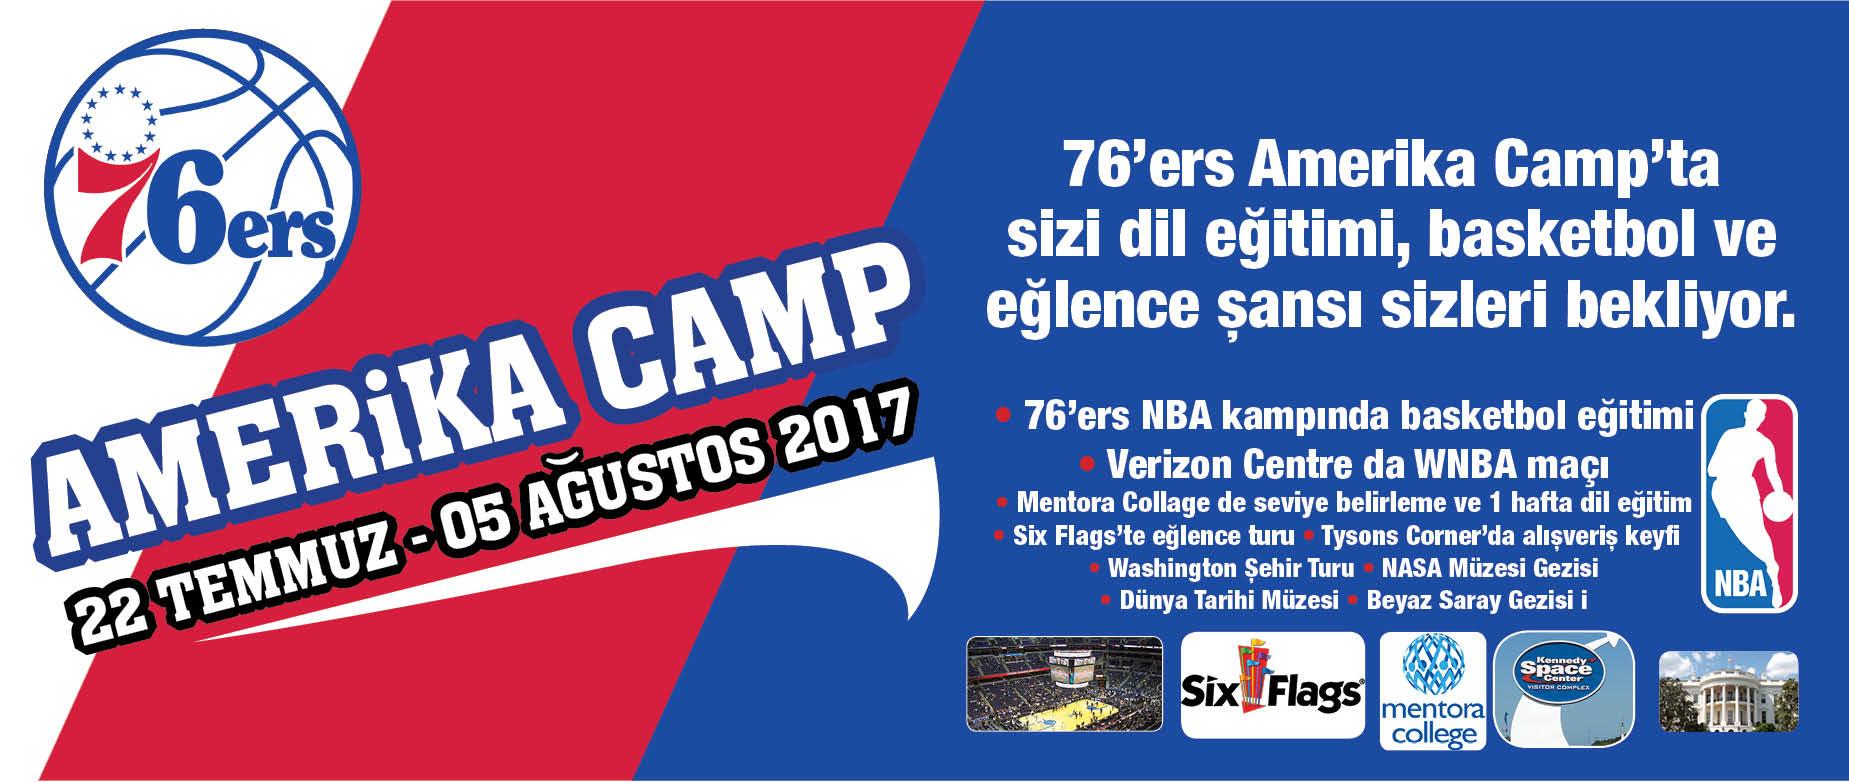 AMERİKA CAMP